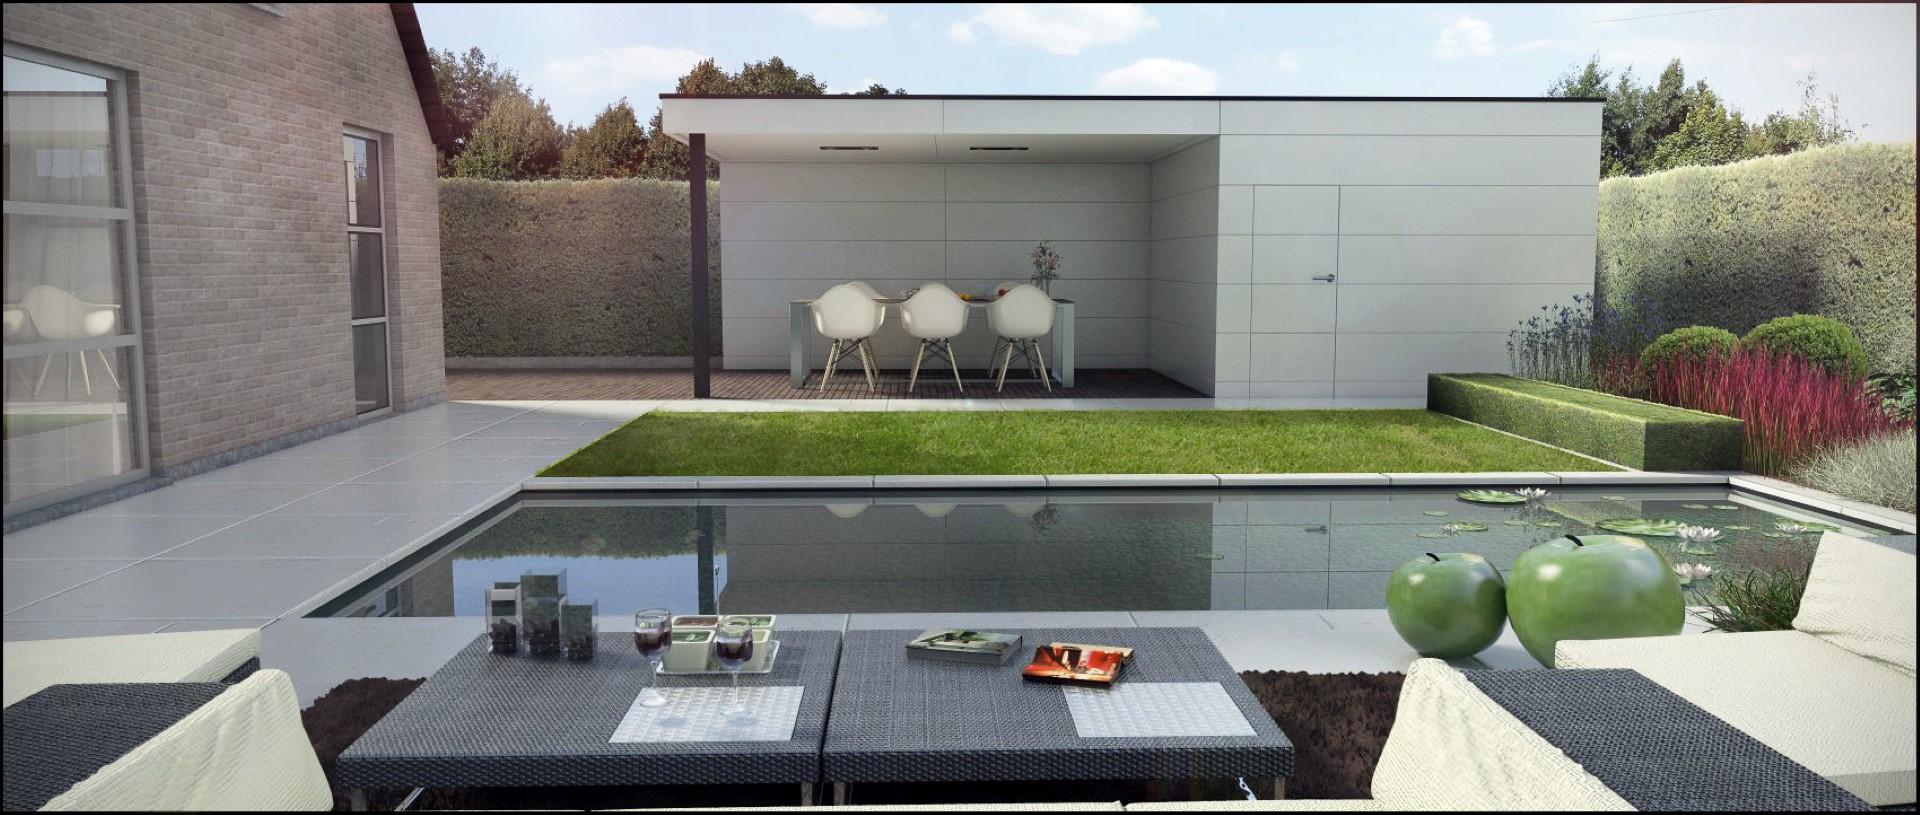 Eco tuinarchitectengroep 3d projecten moderne tuin zottegem - Massief idee van tuin ...